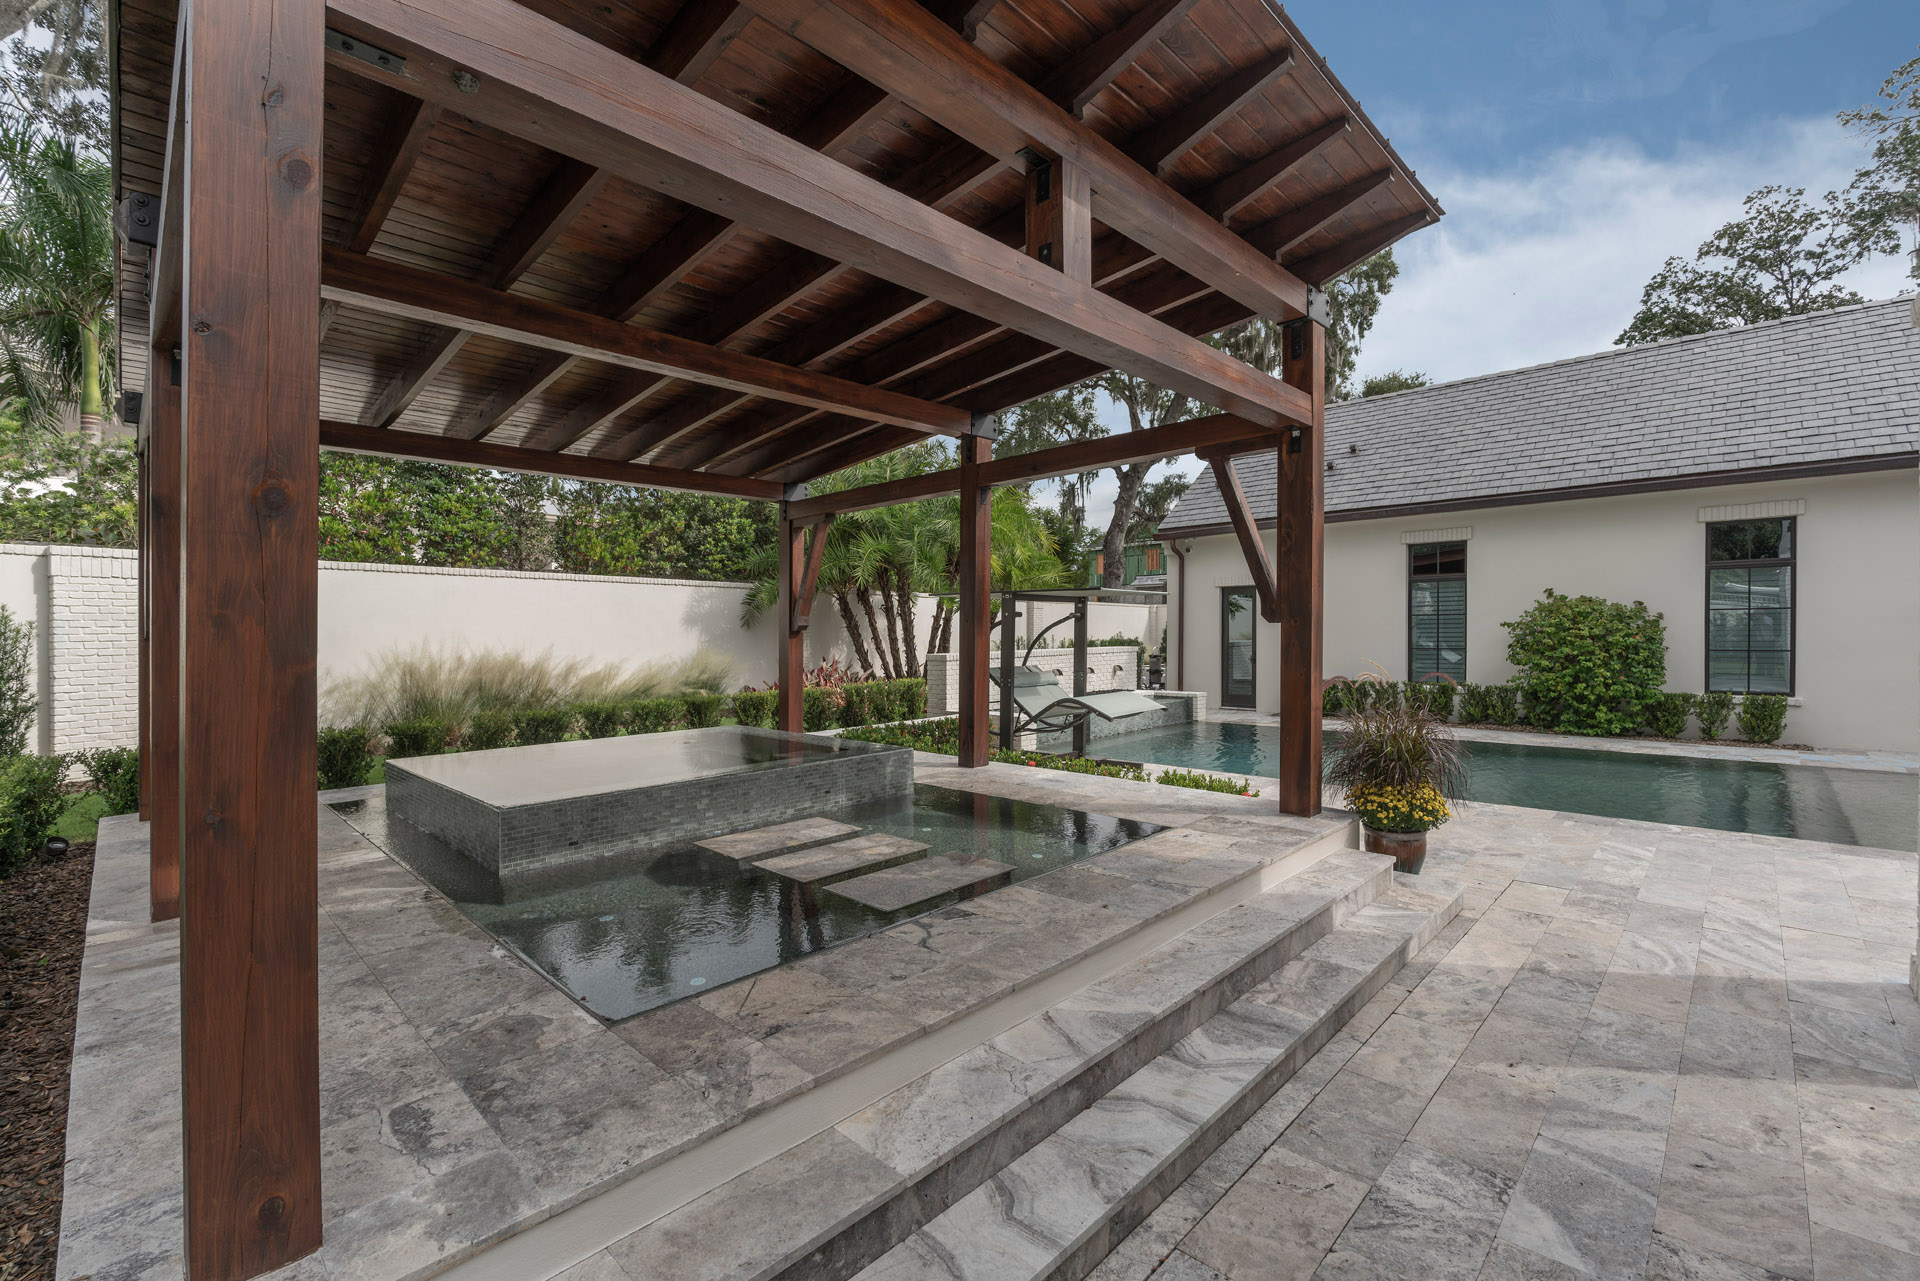 custom pool and gazebo built by Einheit Homes